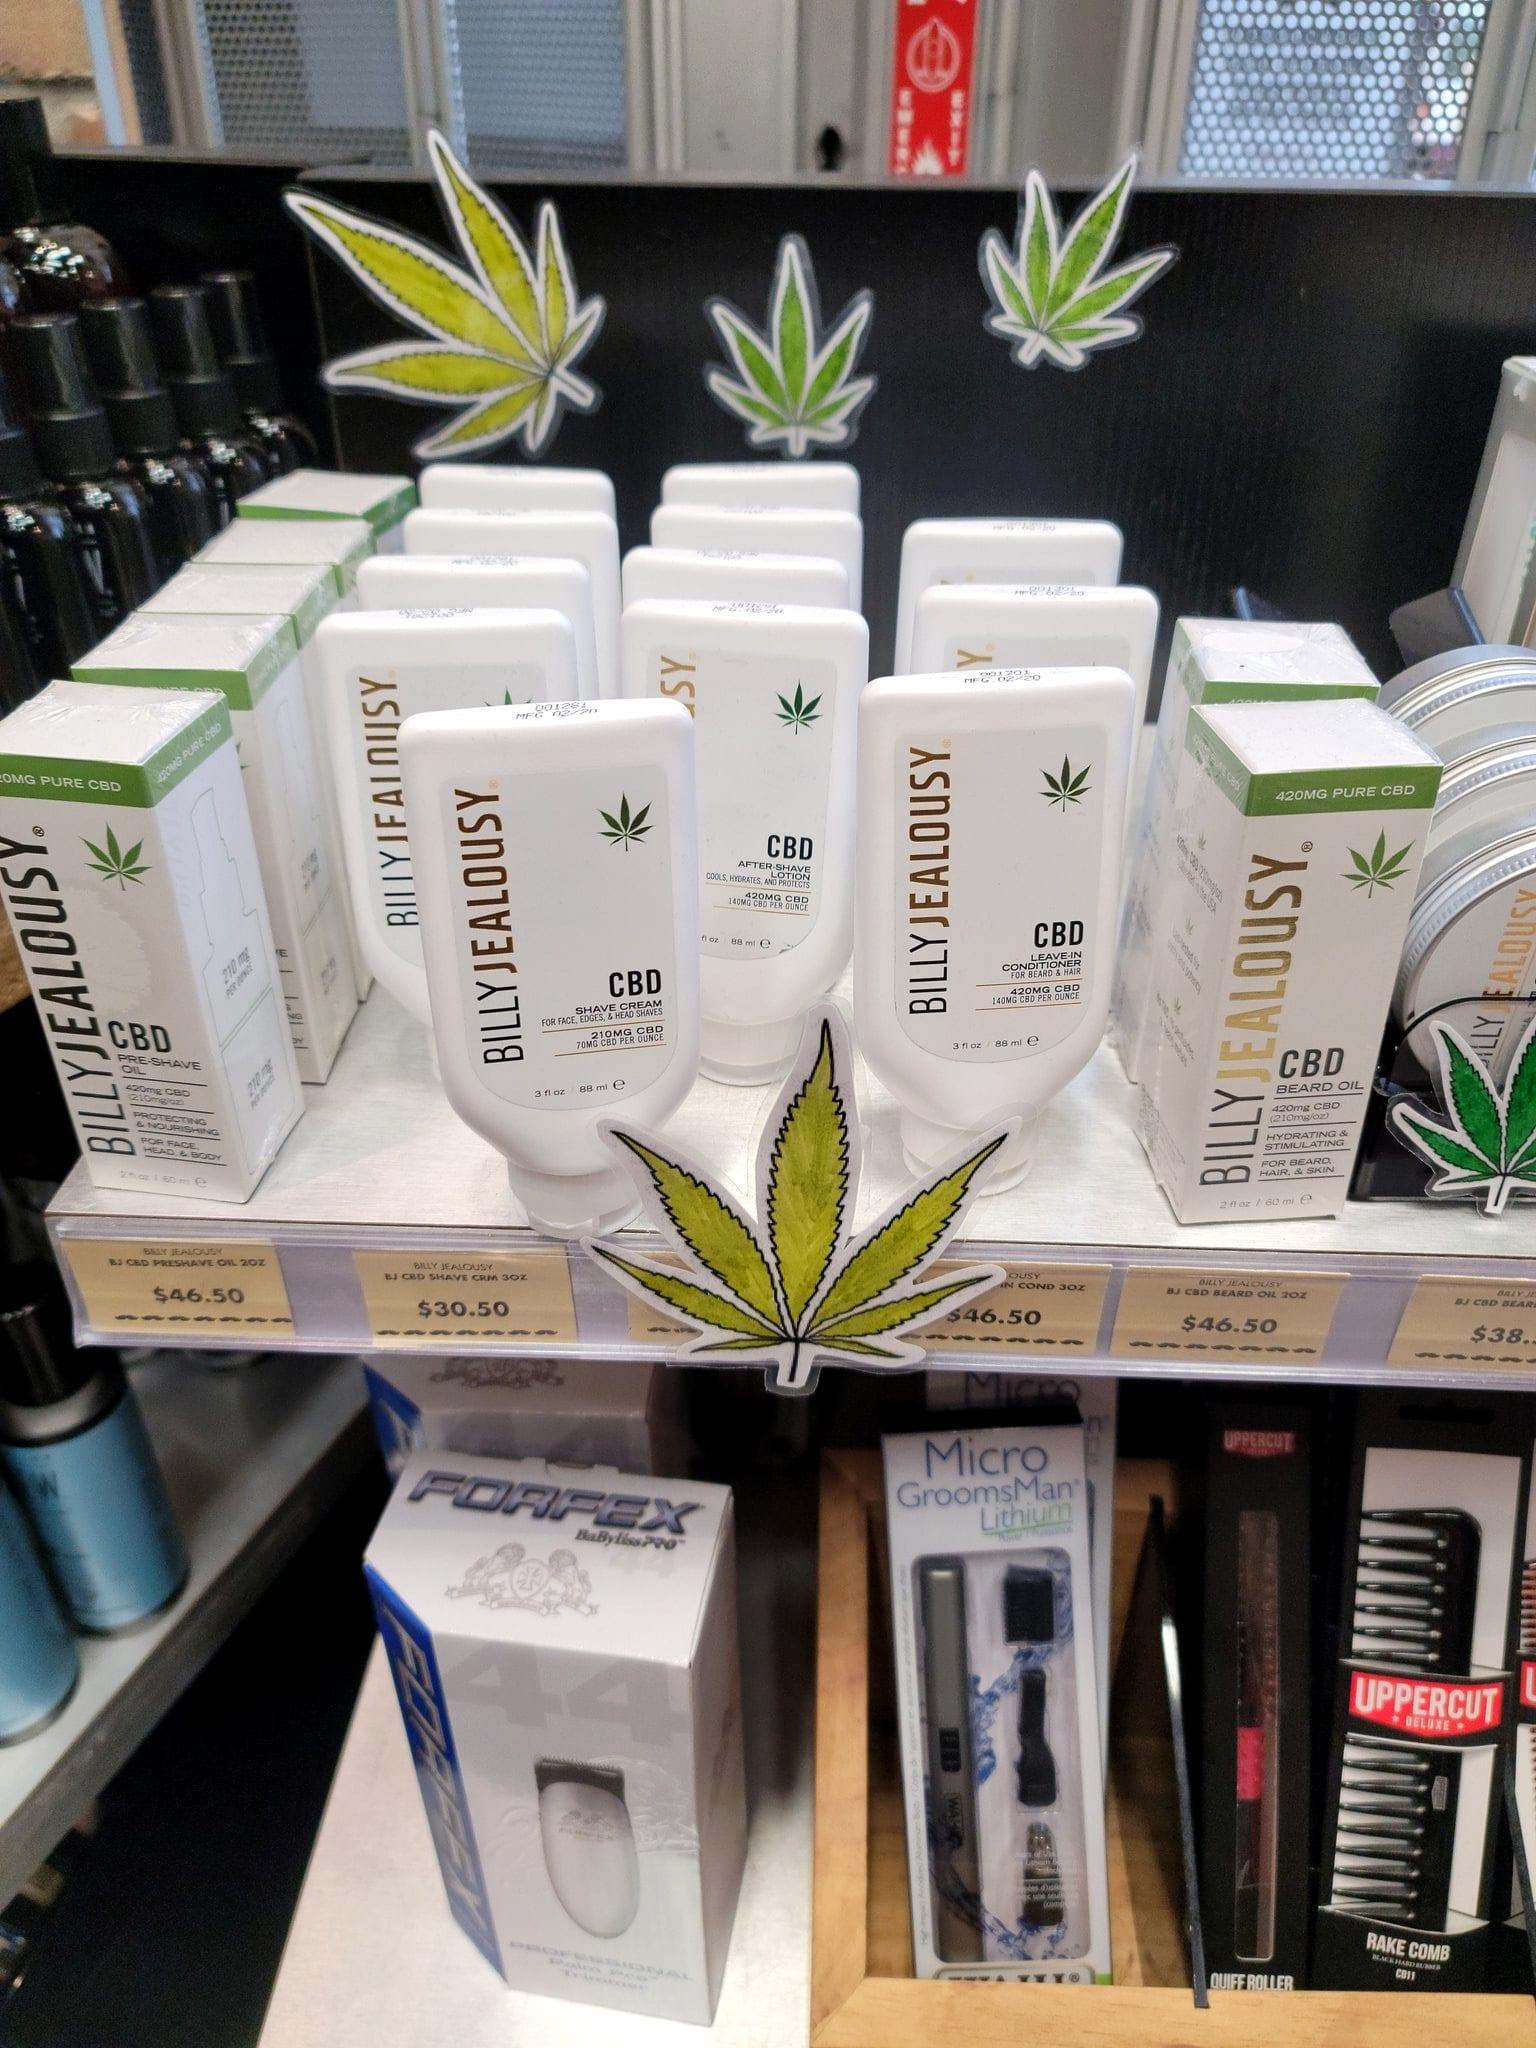 Illict CBD shampoo in plain view — what's it to you? Tommy Guns shelf